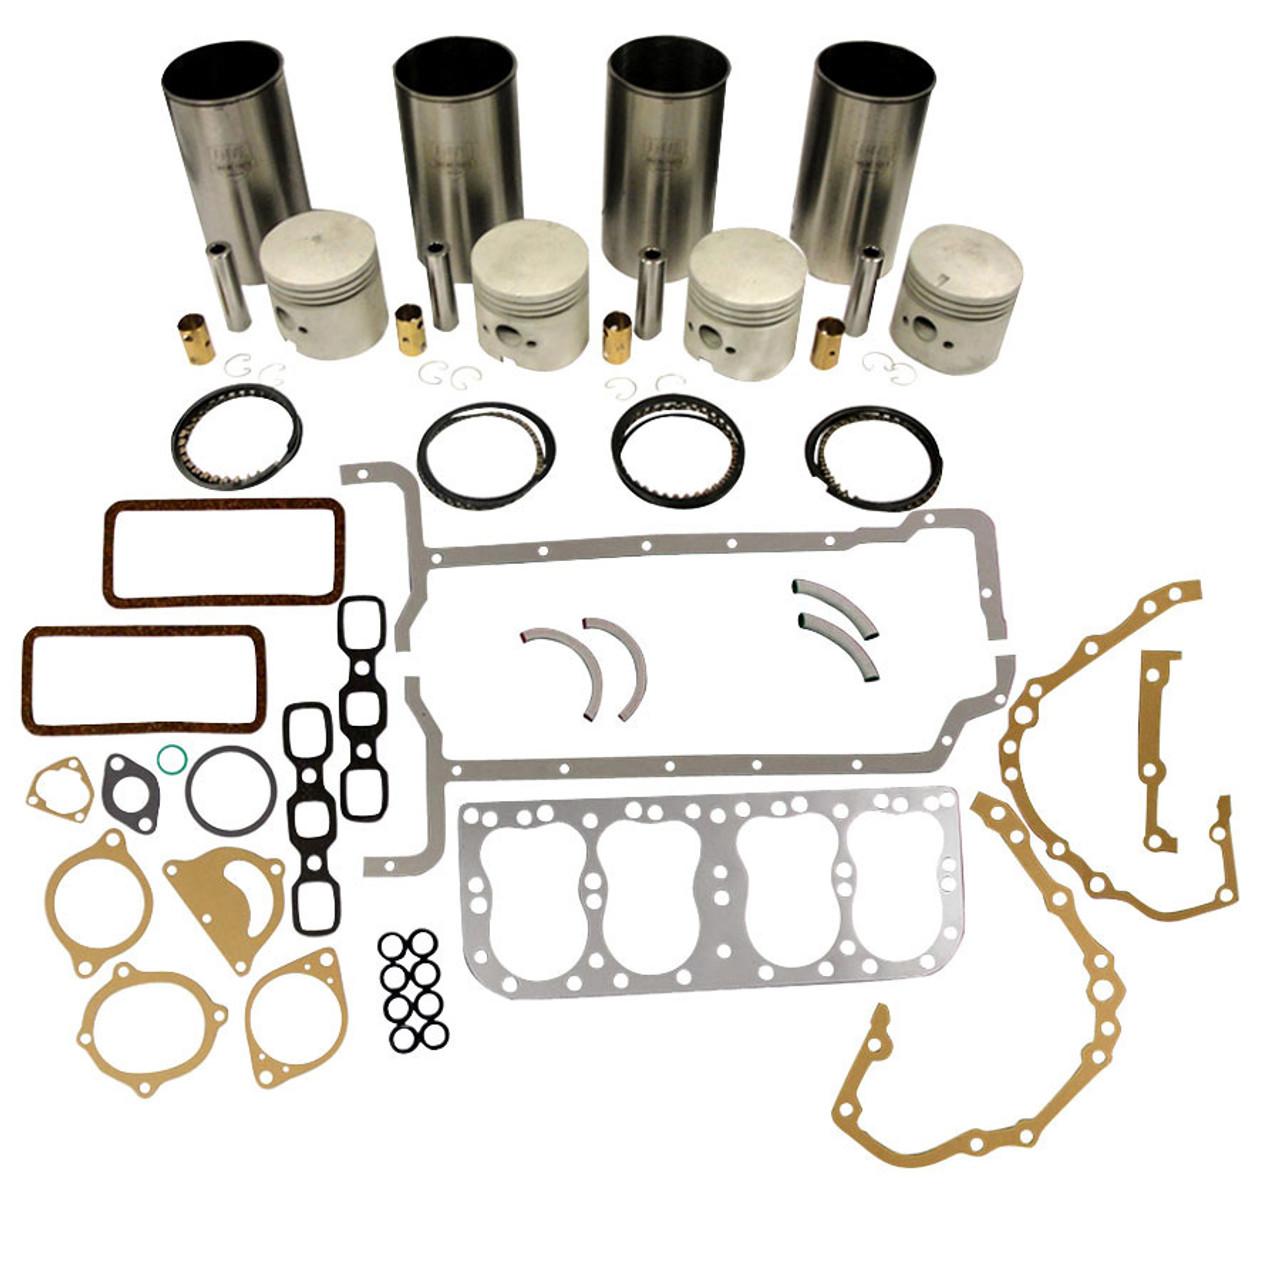 Ford Basic Engine Overhaul Kit 8N 9N 2N .090 Thick Liners